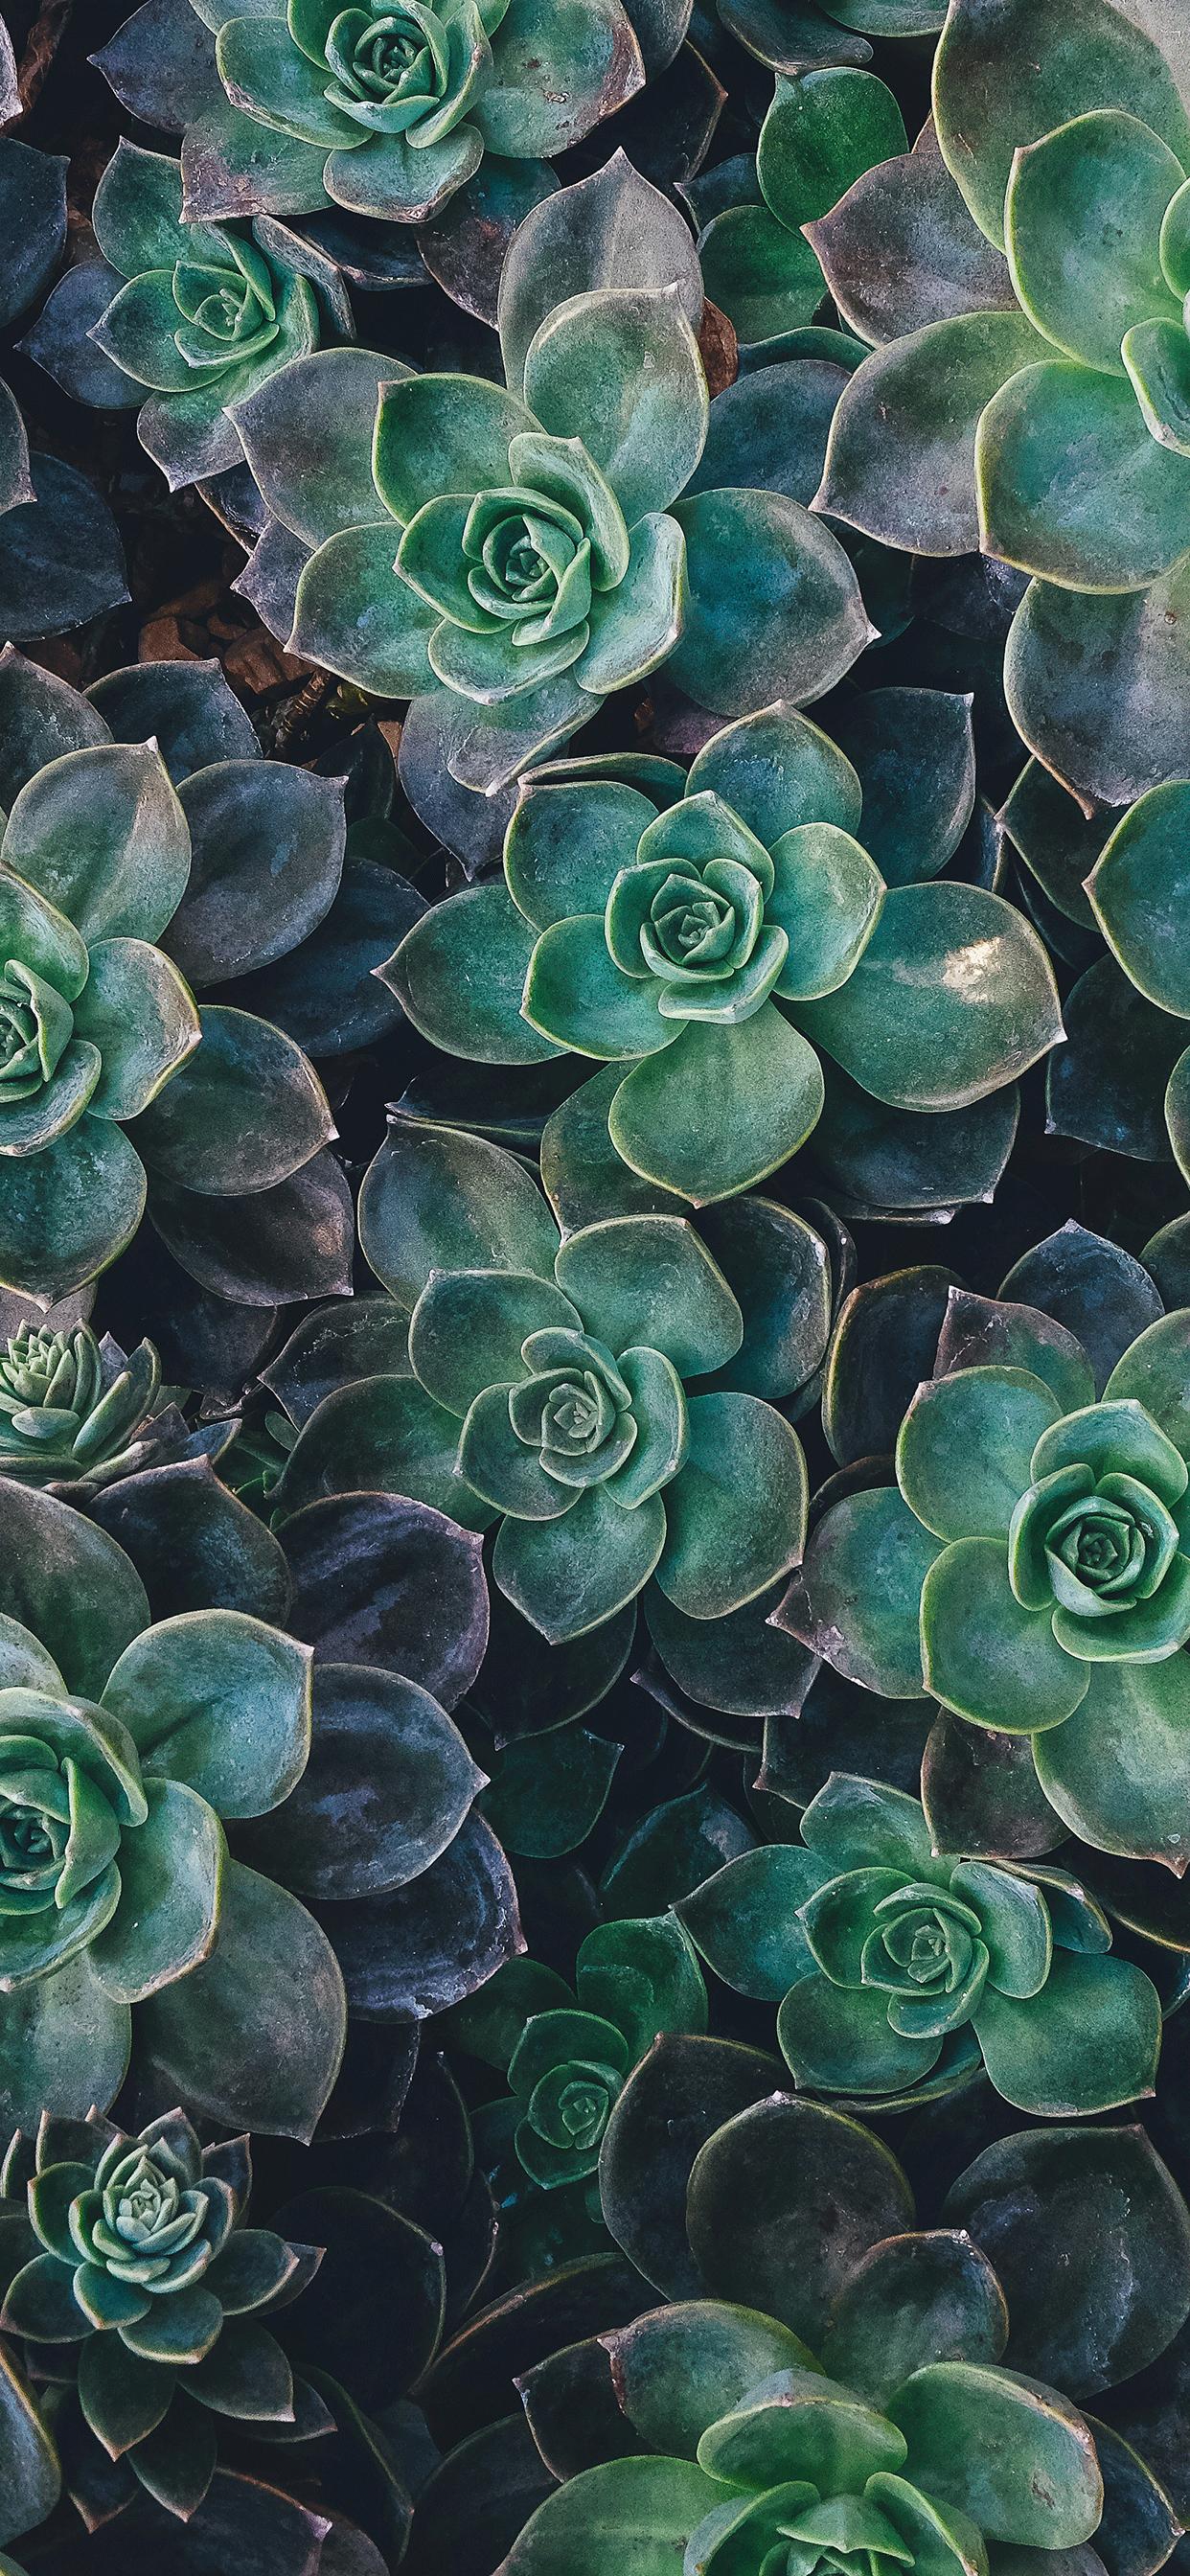 Succulent Plant Wallpaper For Iphone 11 Pro Max X 8 7